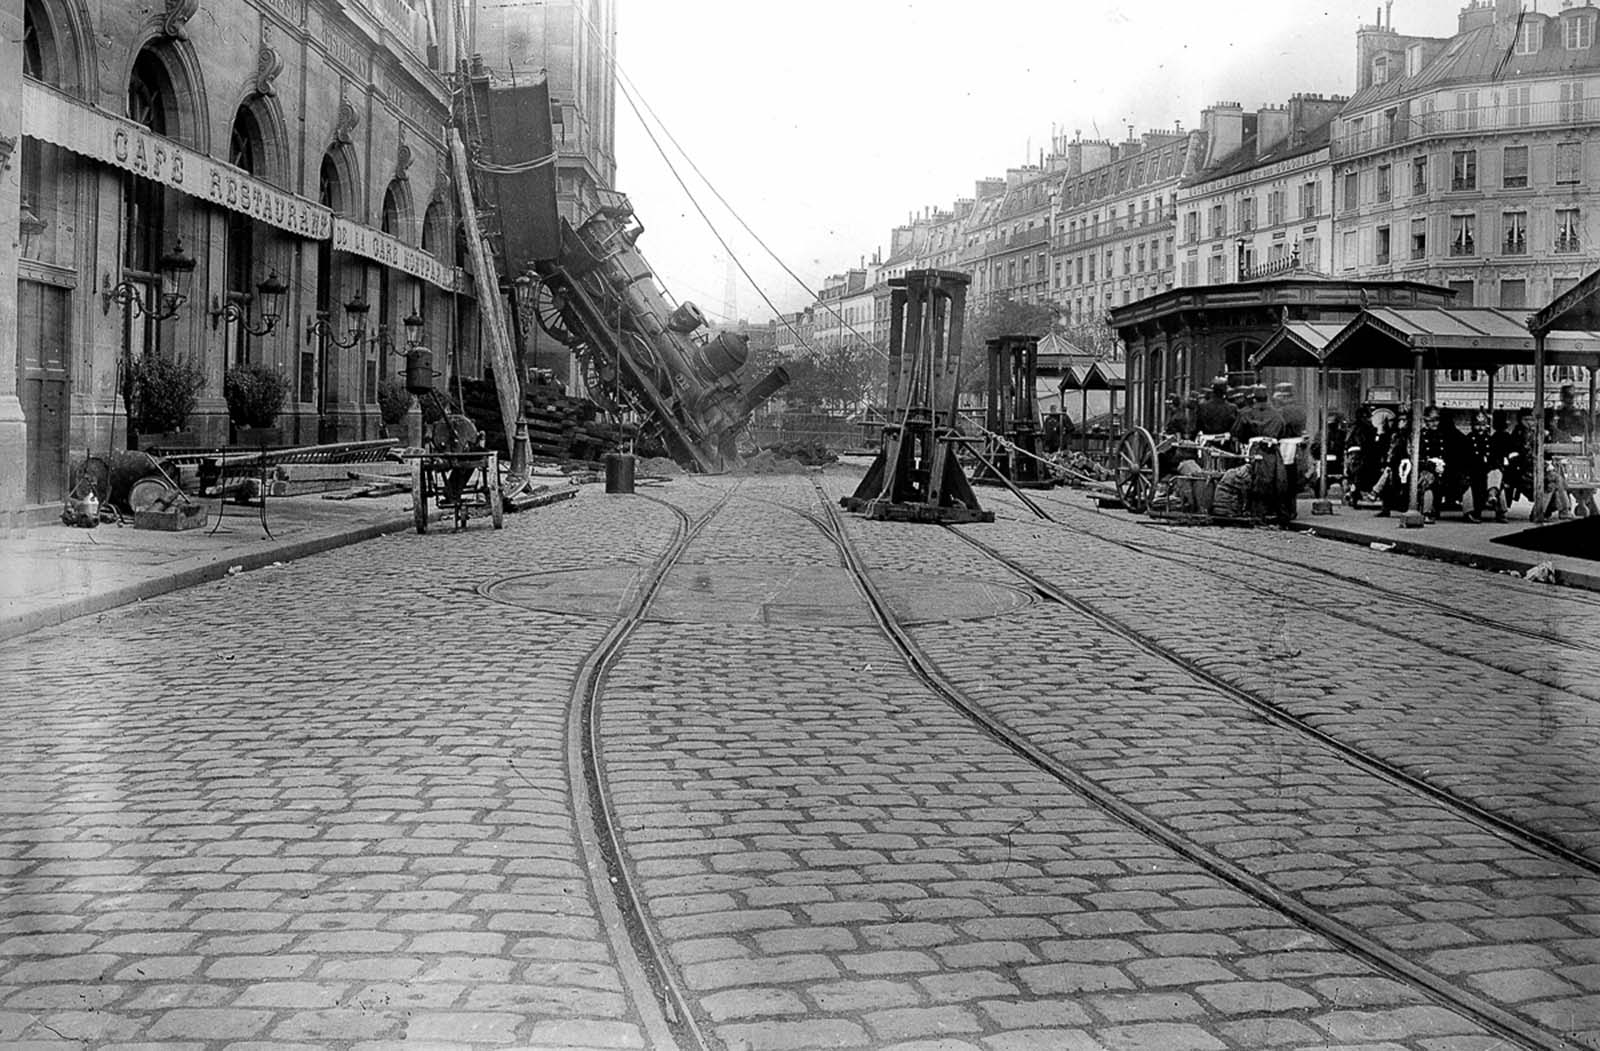 Montparnasse Train Wreck photos